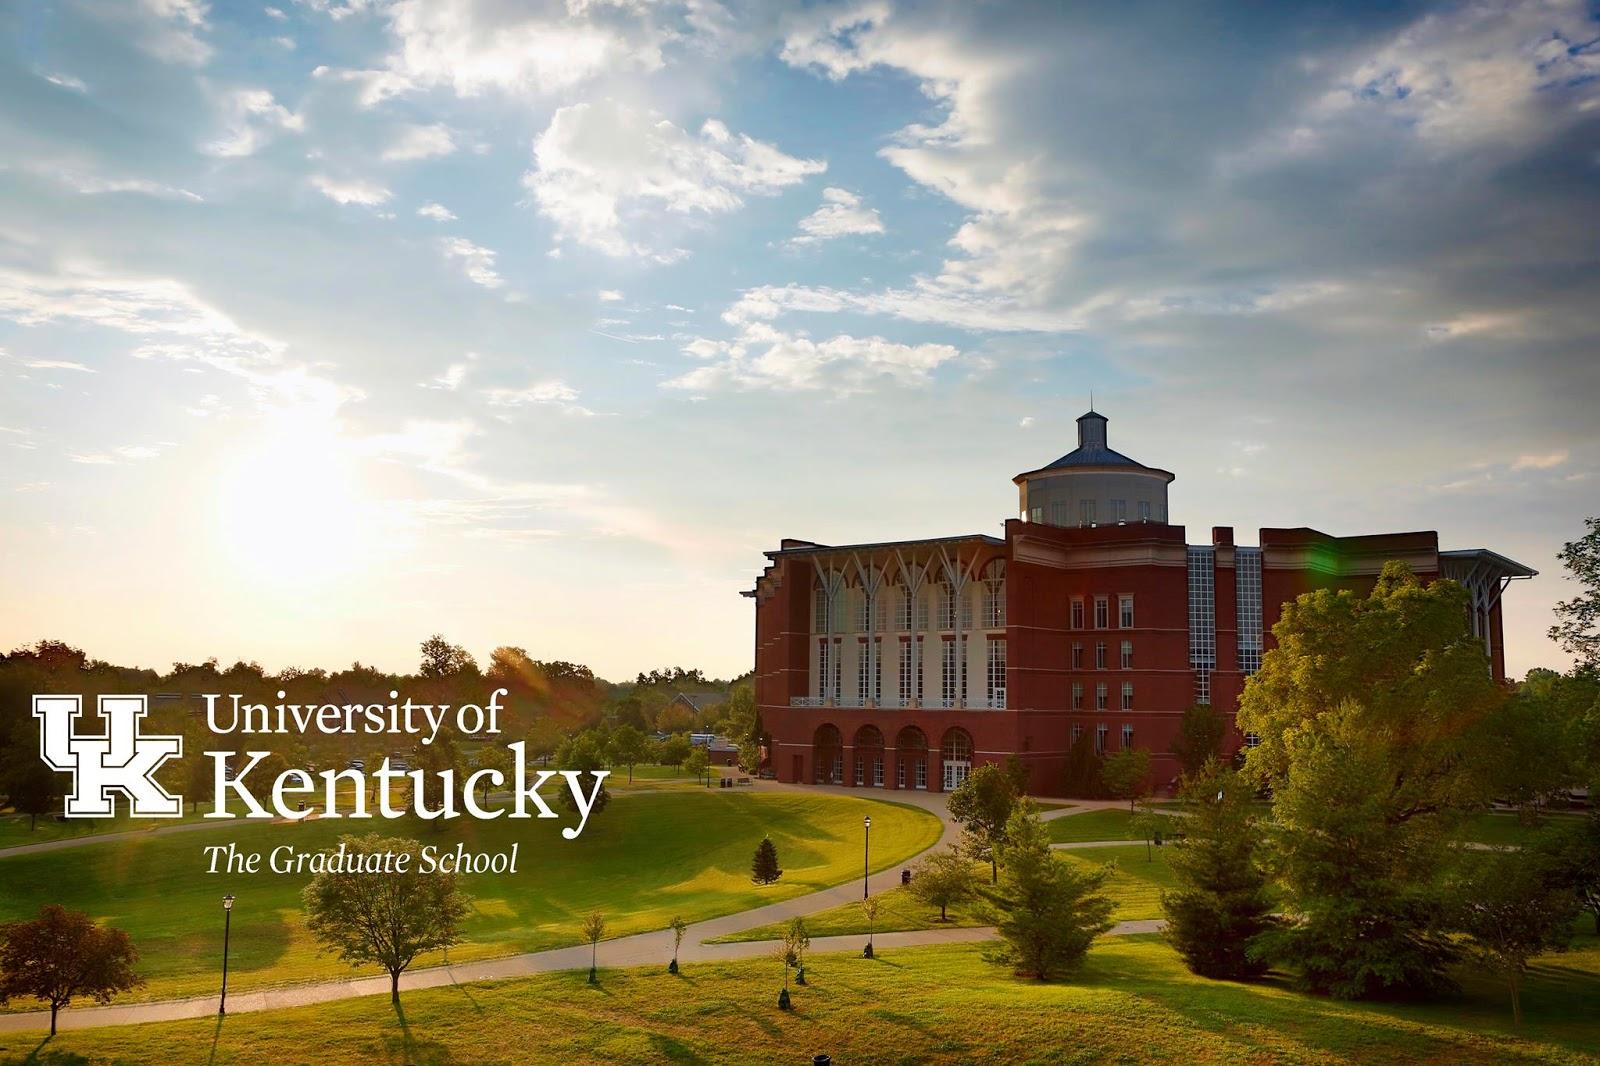 Recap of My First Keynote Speech at the University of Kentucky